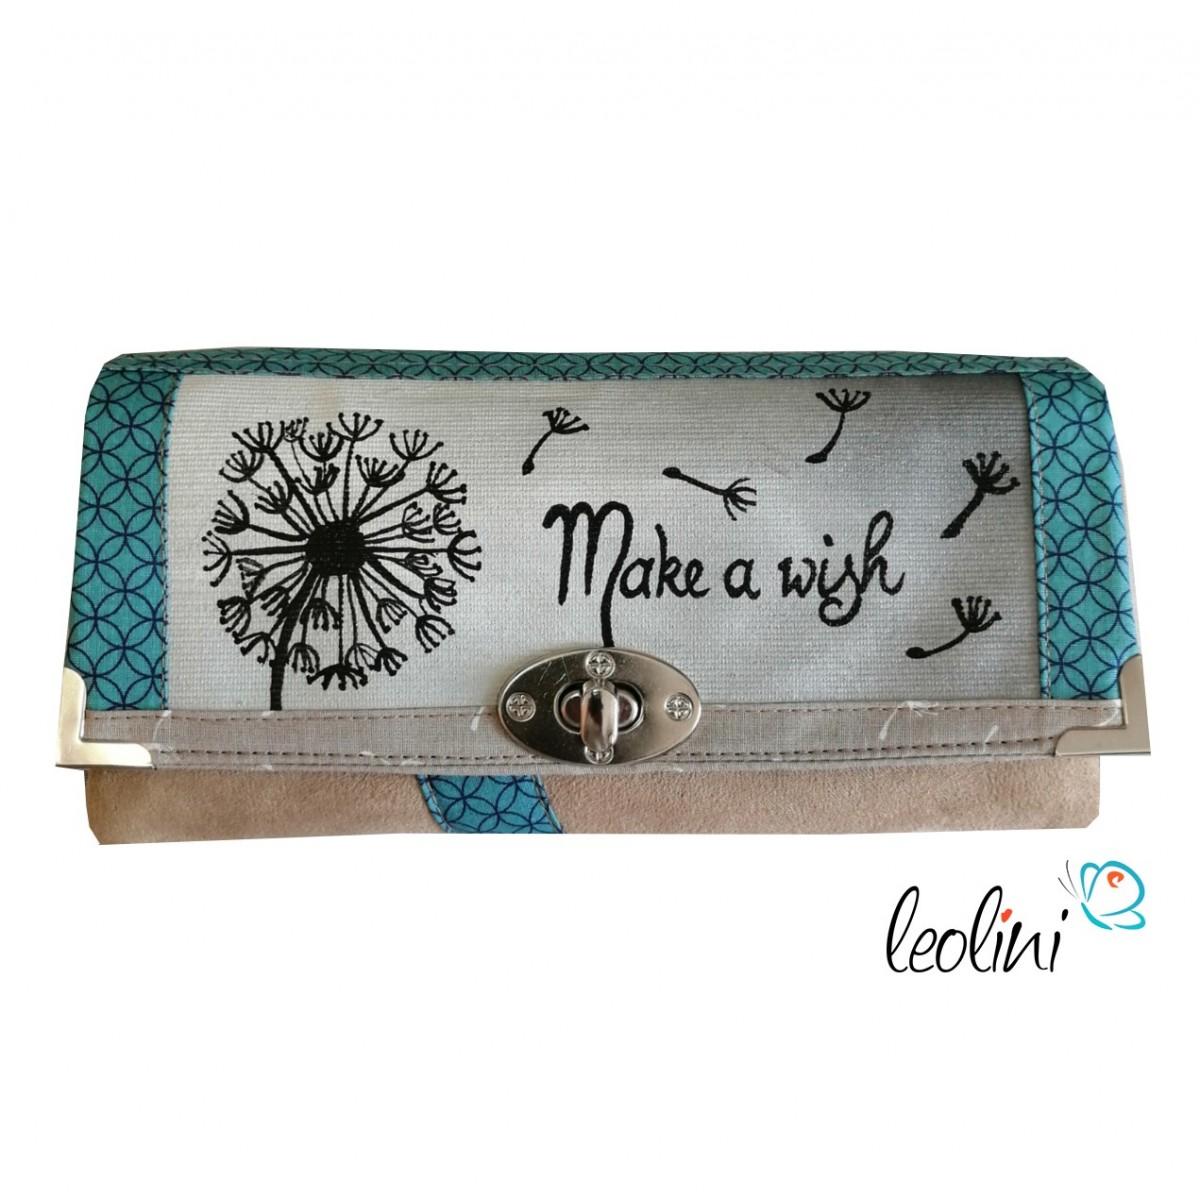 Große Malereigeldbörse - Damen Portemonnaie Pusteblume Make a wish